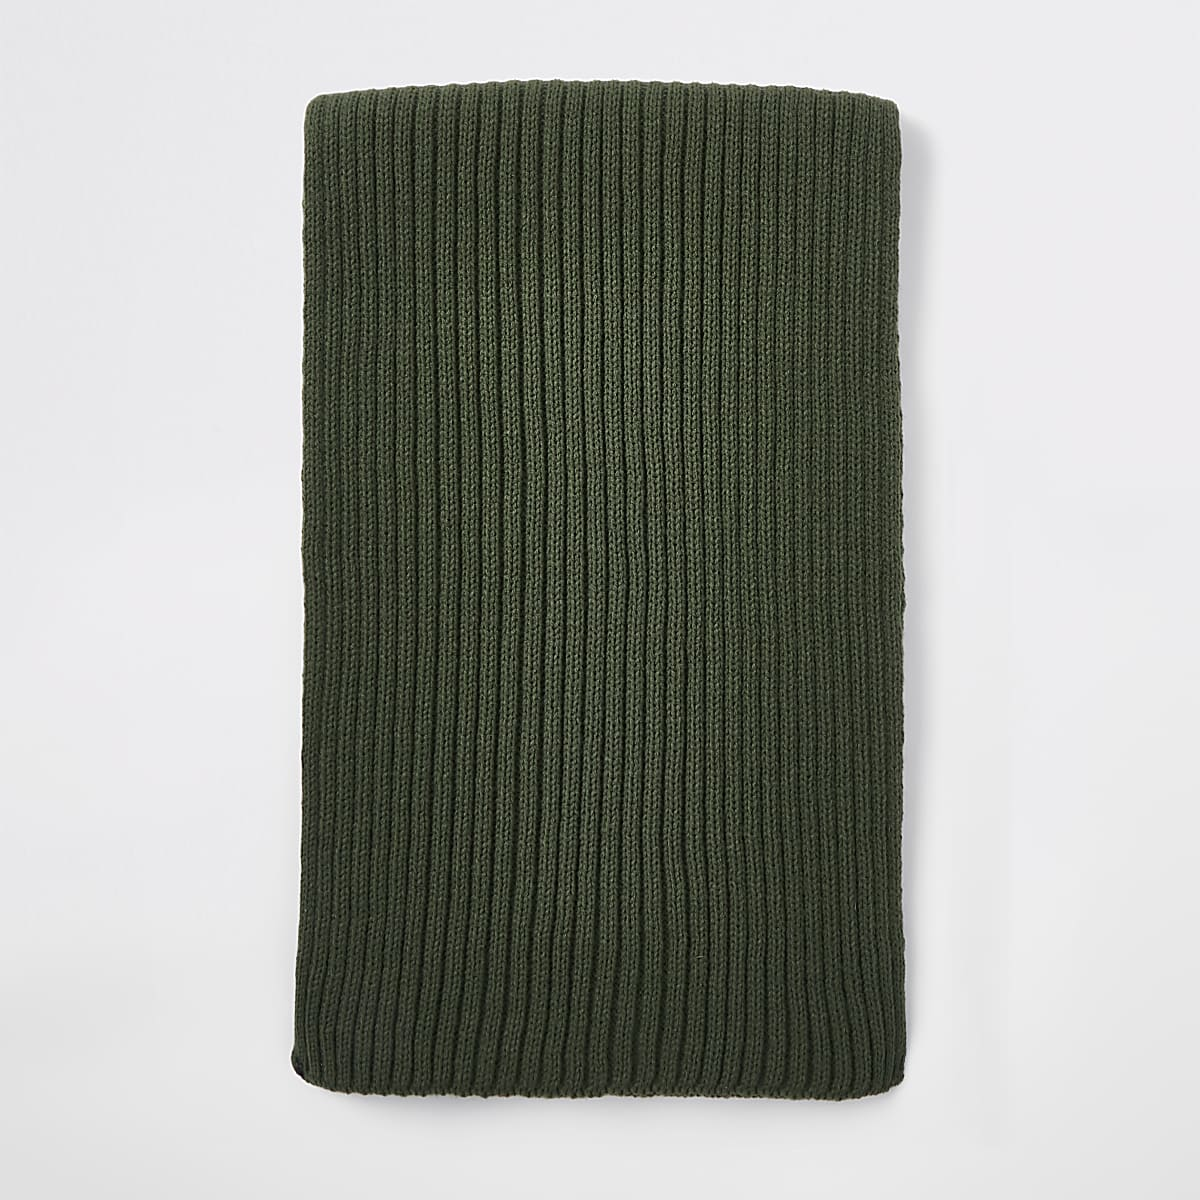 Khaki green rib knitted scarf